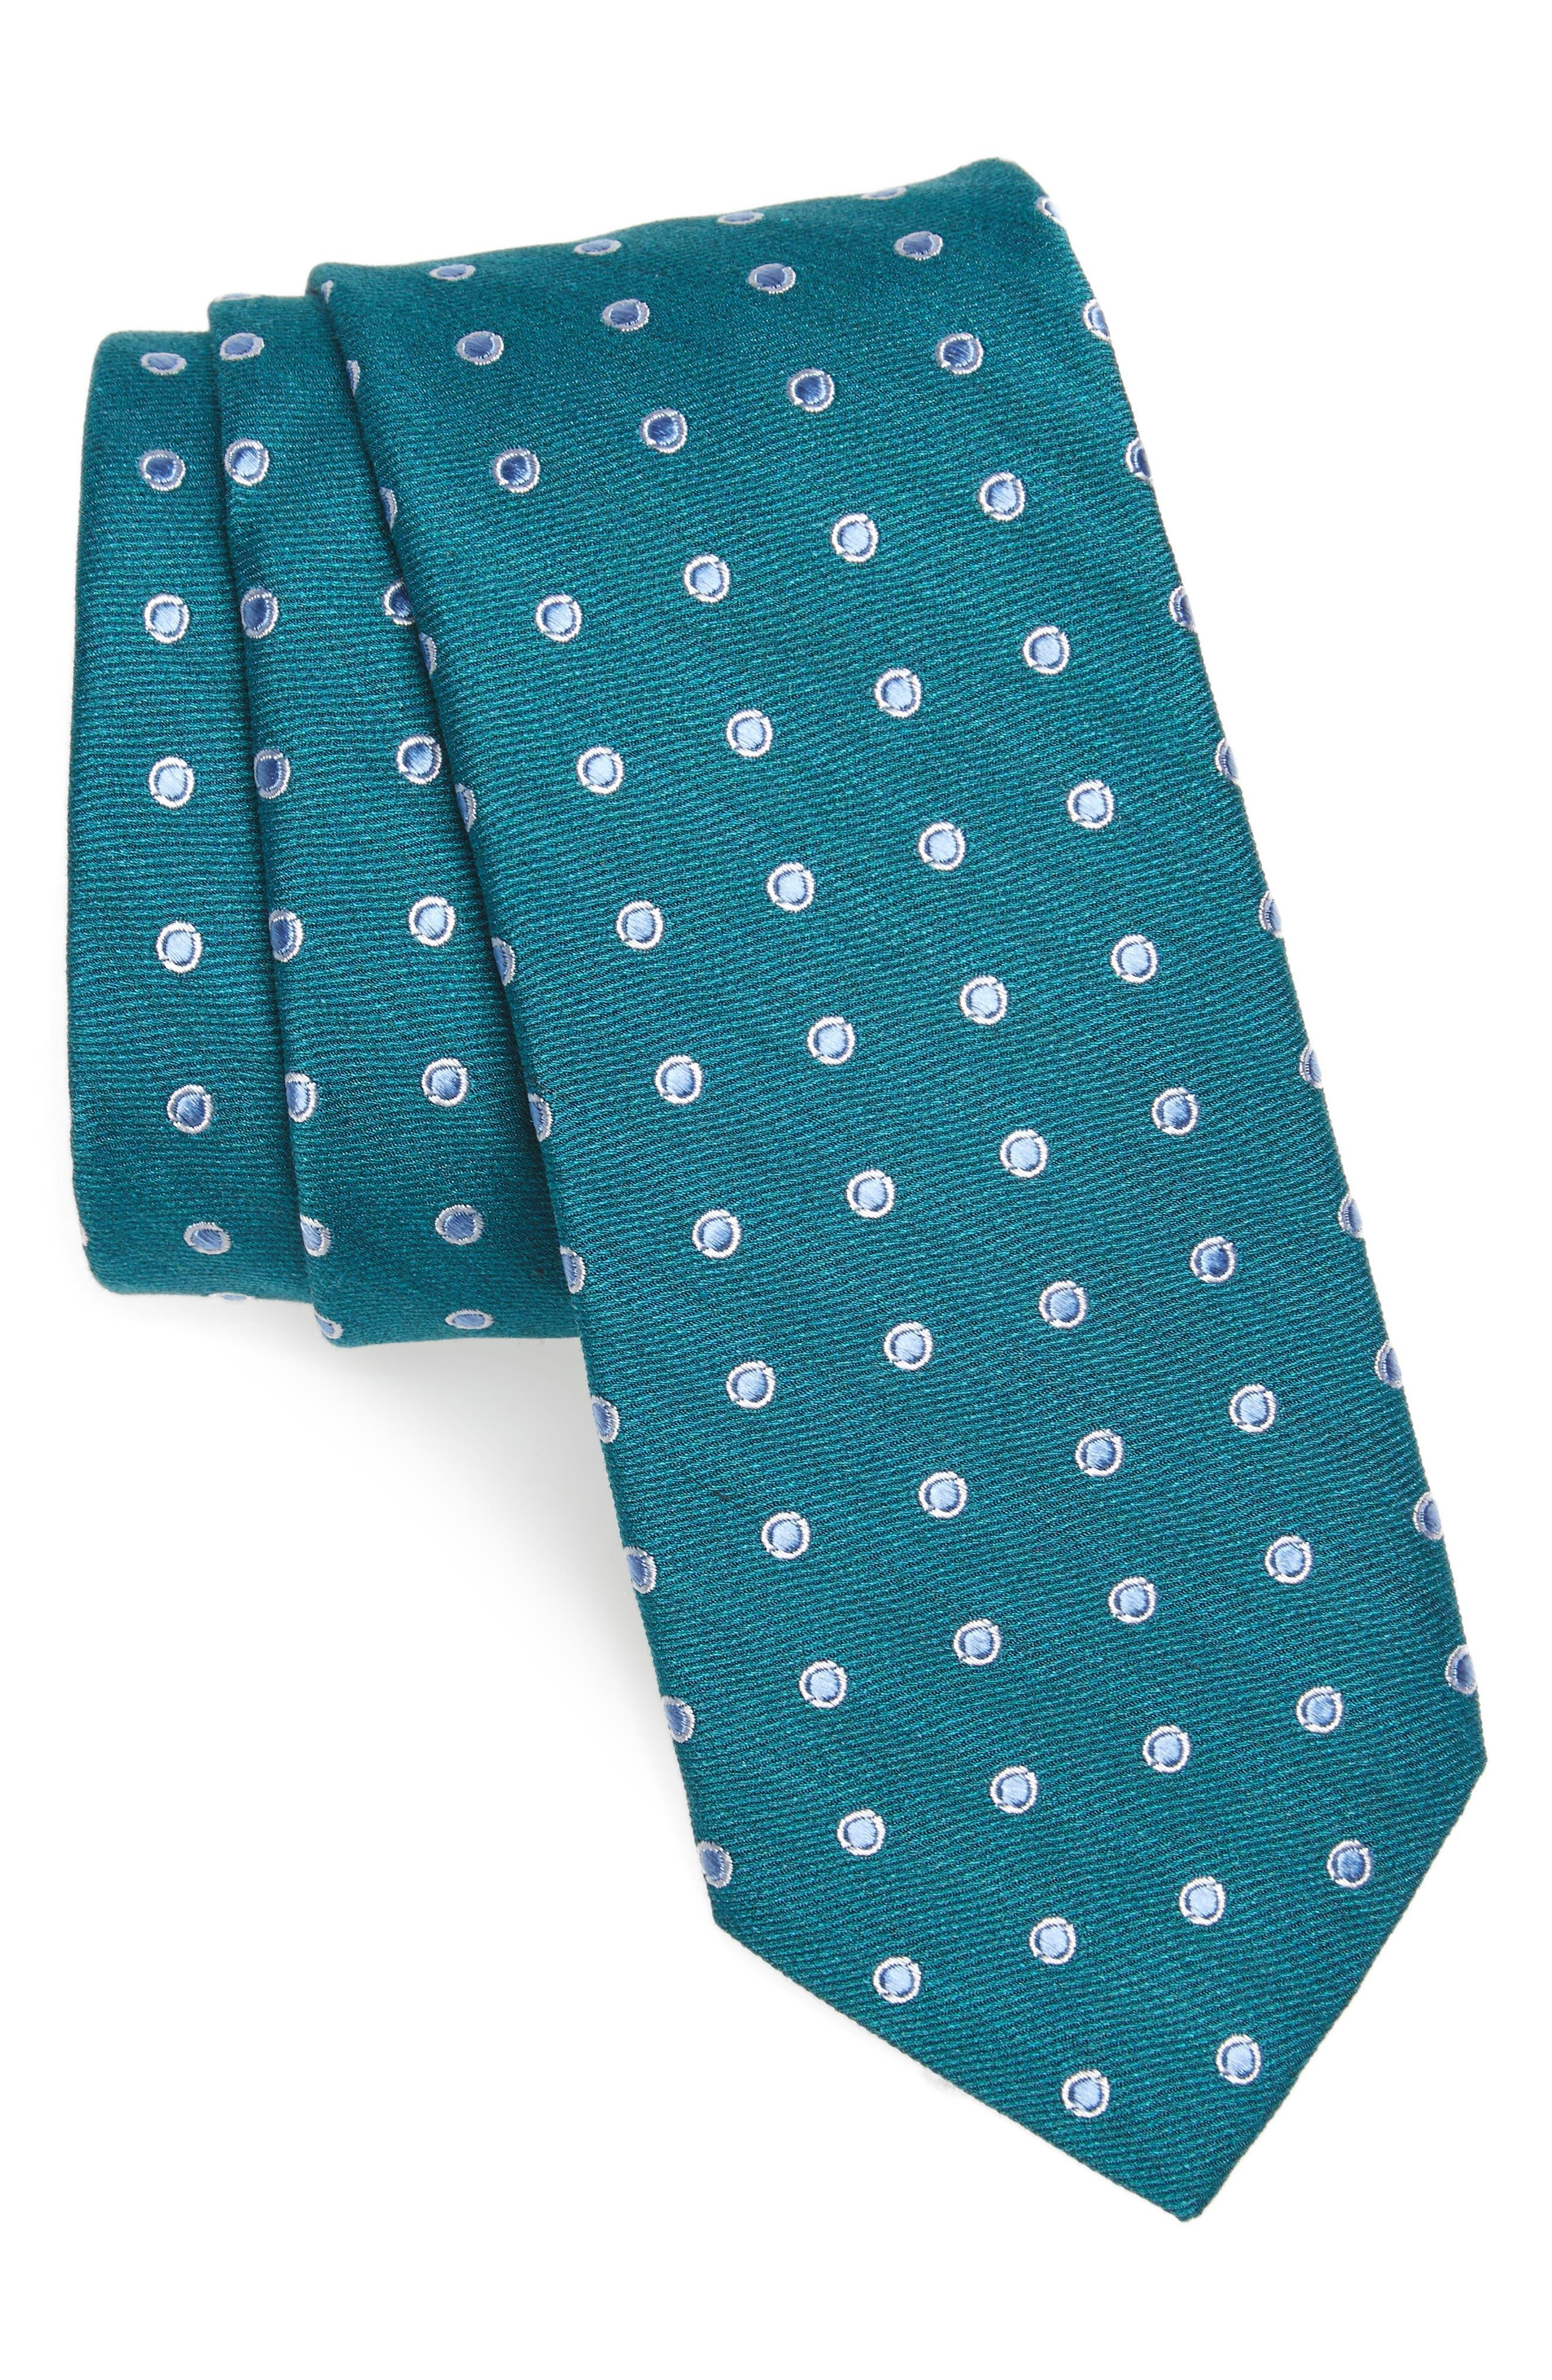 Nordstrom Men's Shop Hester Dot Print Tie